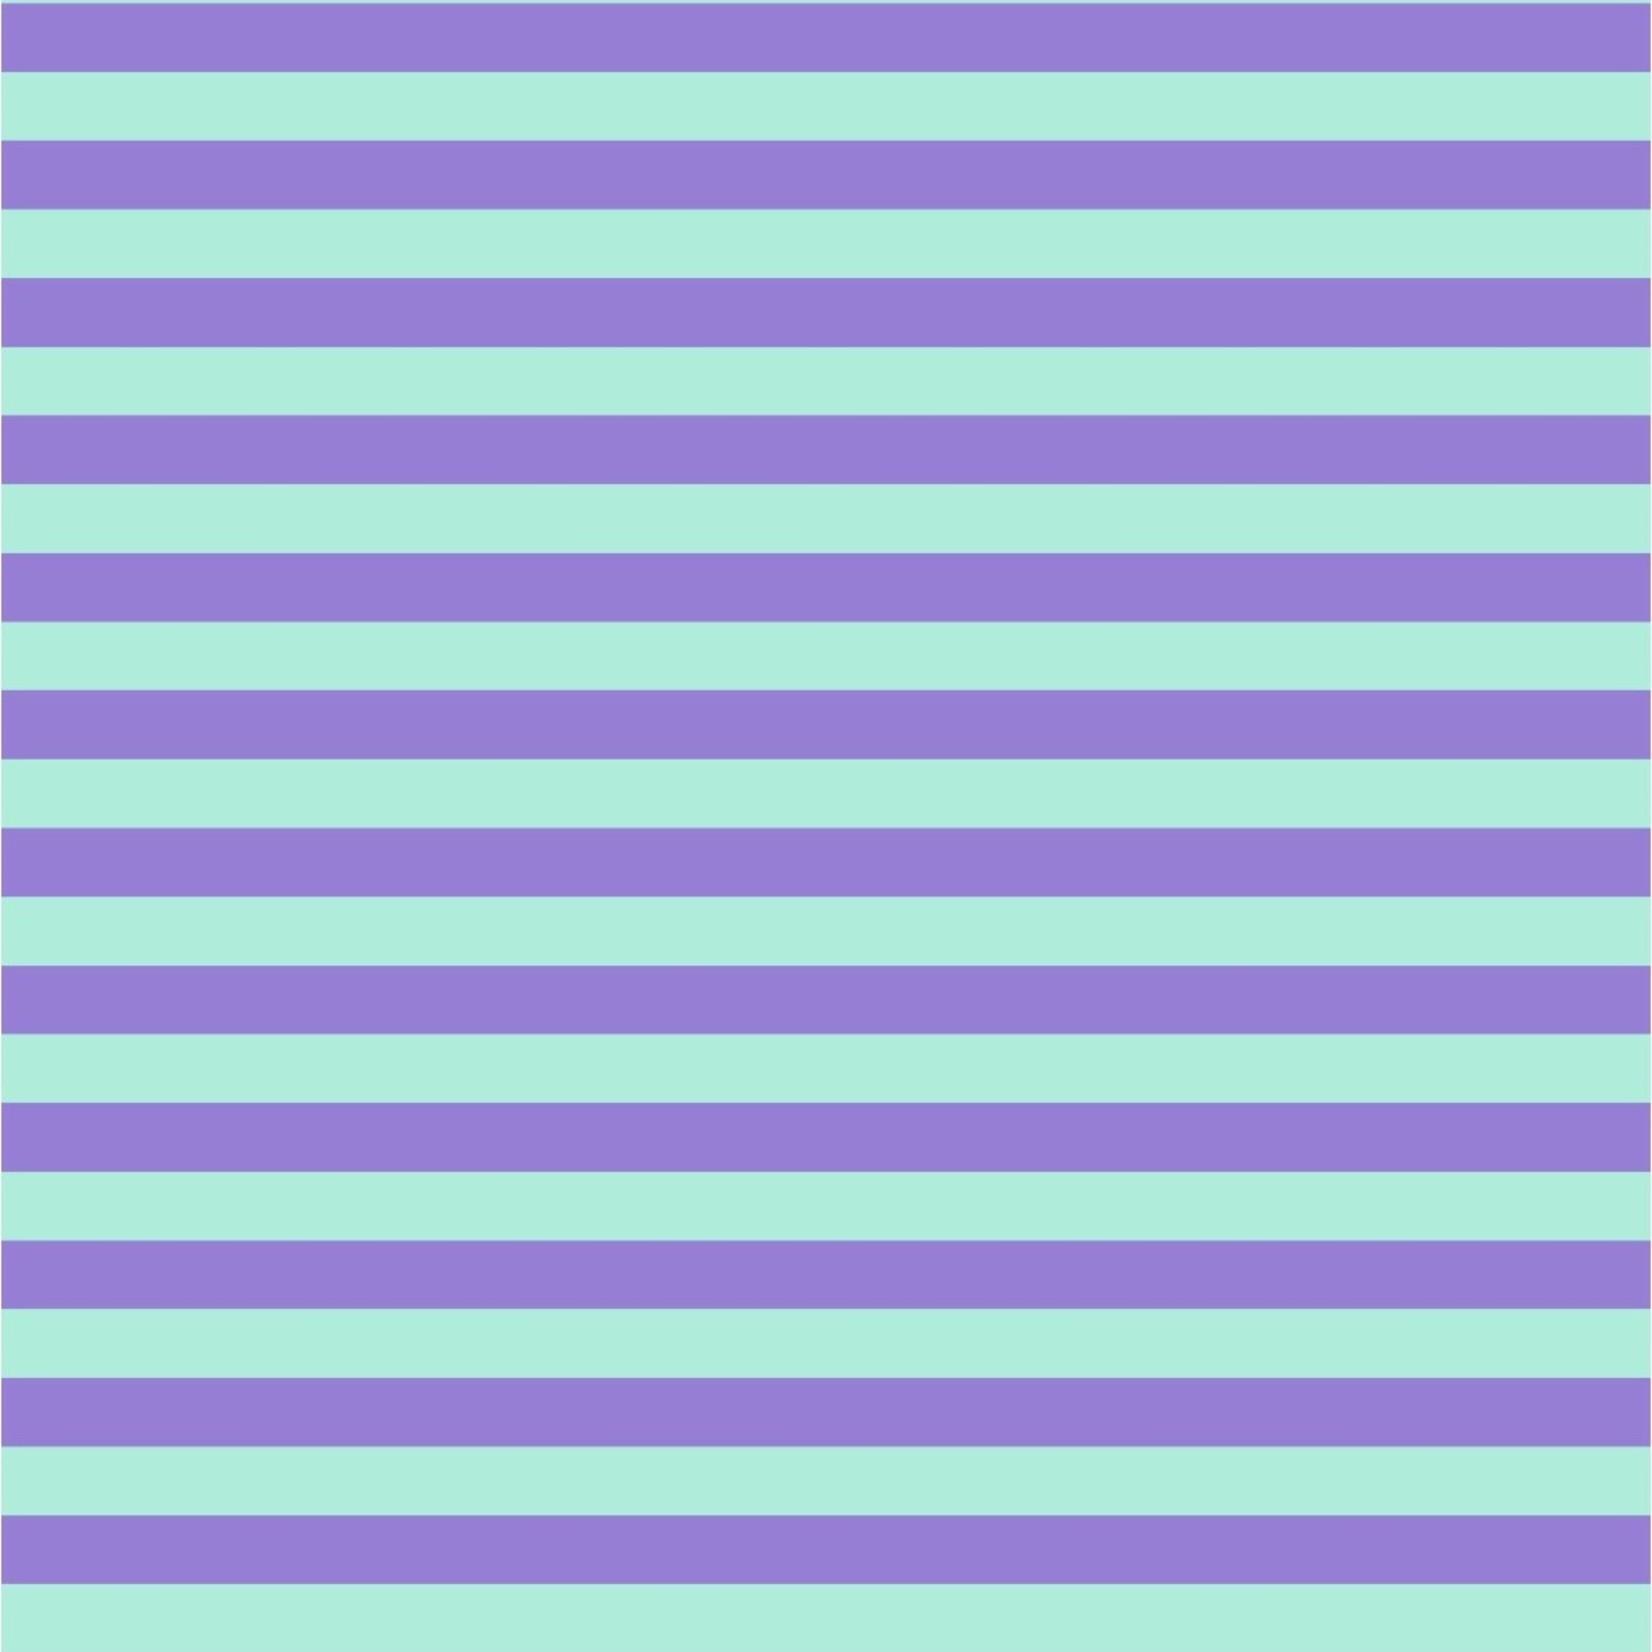 Tula Pink Tula Tent Stripe- Petunia 0.17 per cm or $17/m